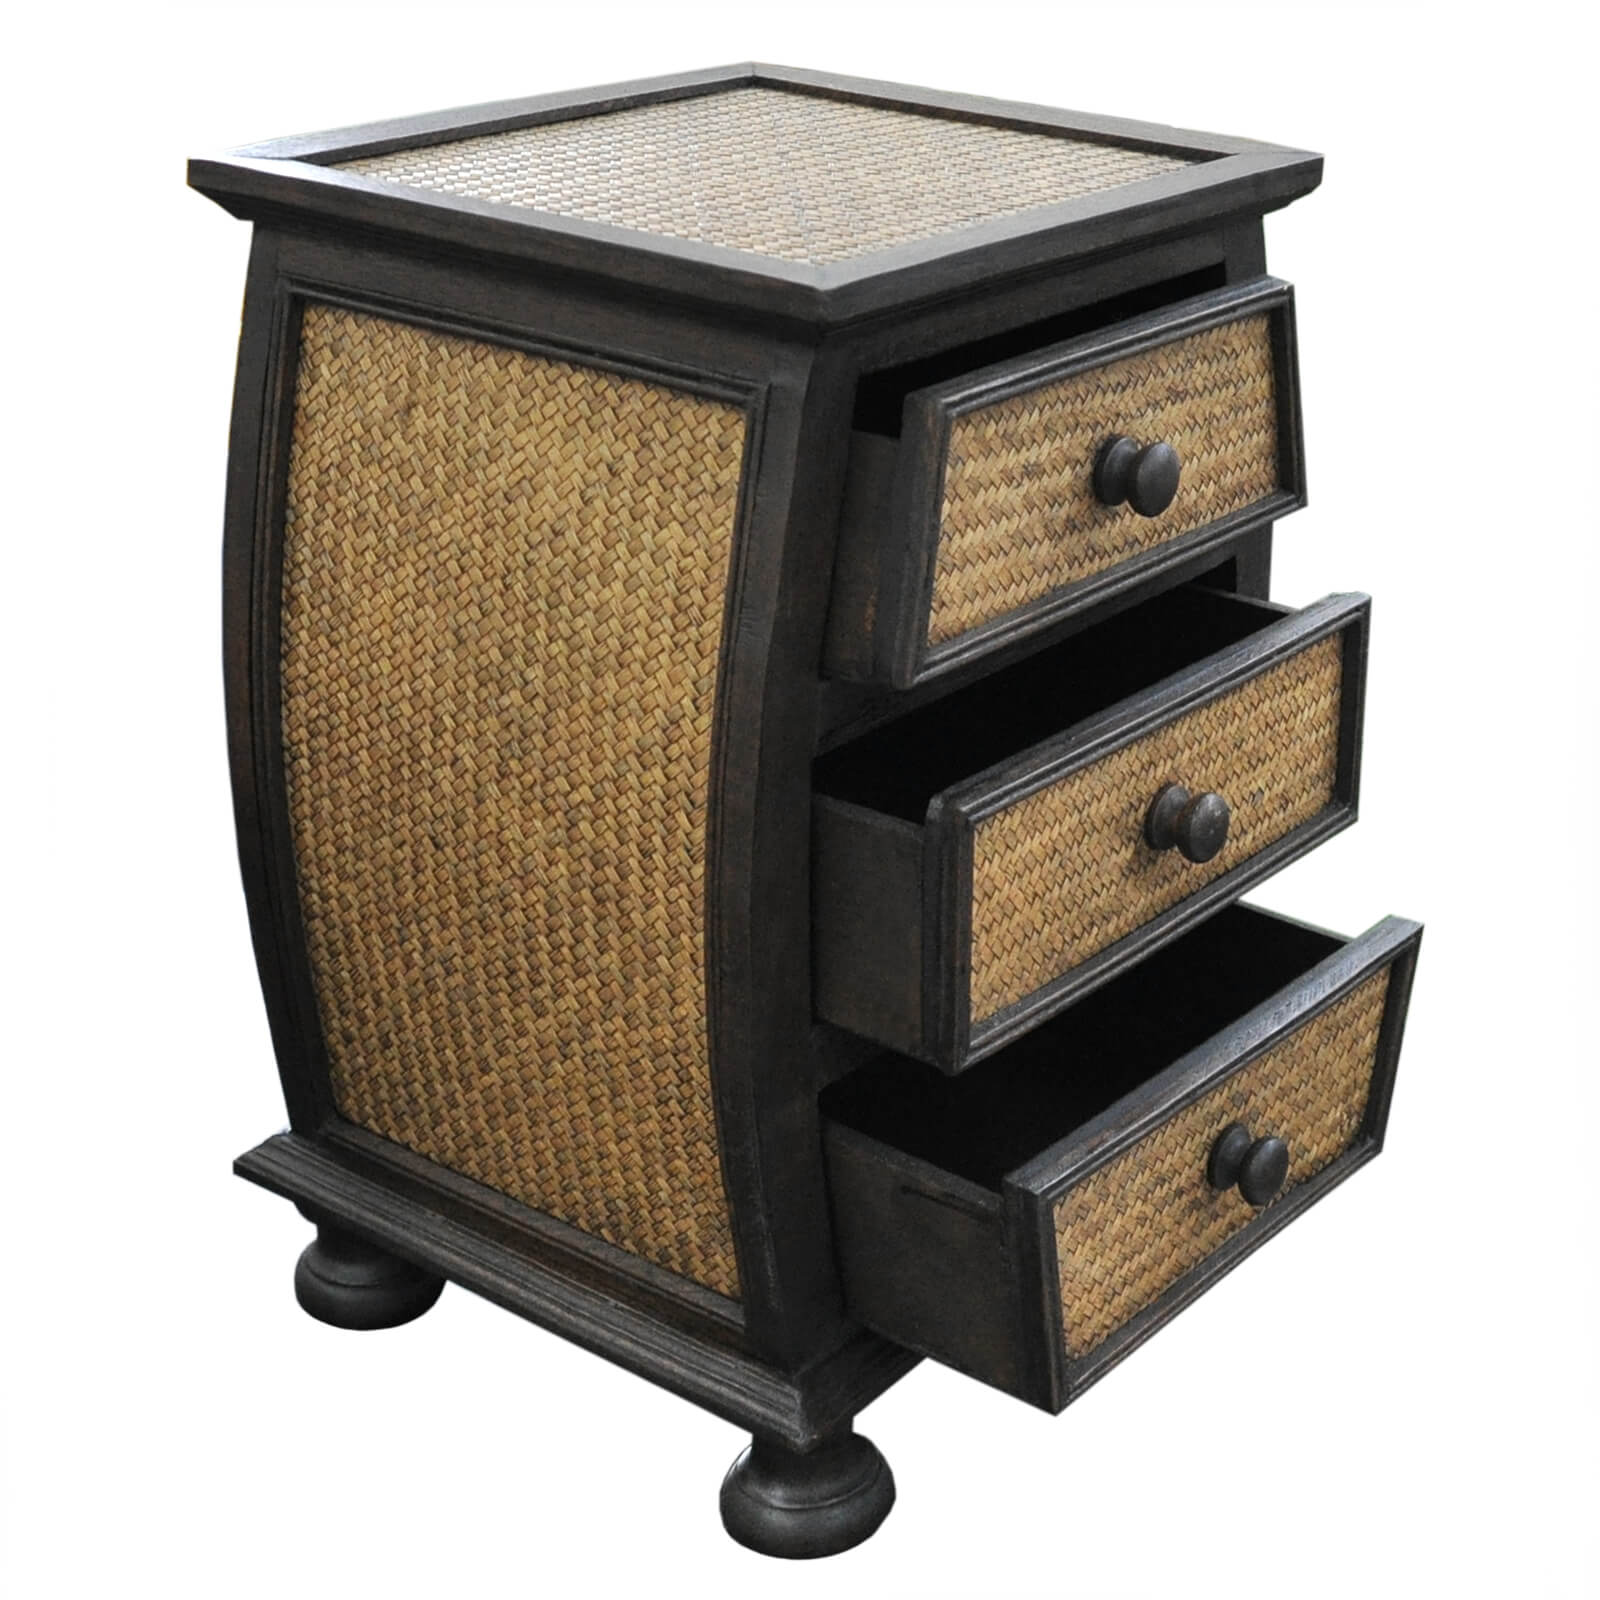 commodes table chevet meuble de rangement artisanal fabriqu en tha lande ebay. Black Bedroom Furniture Sets. Home Design Ideas